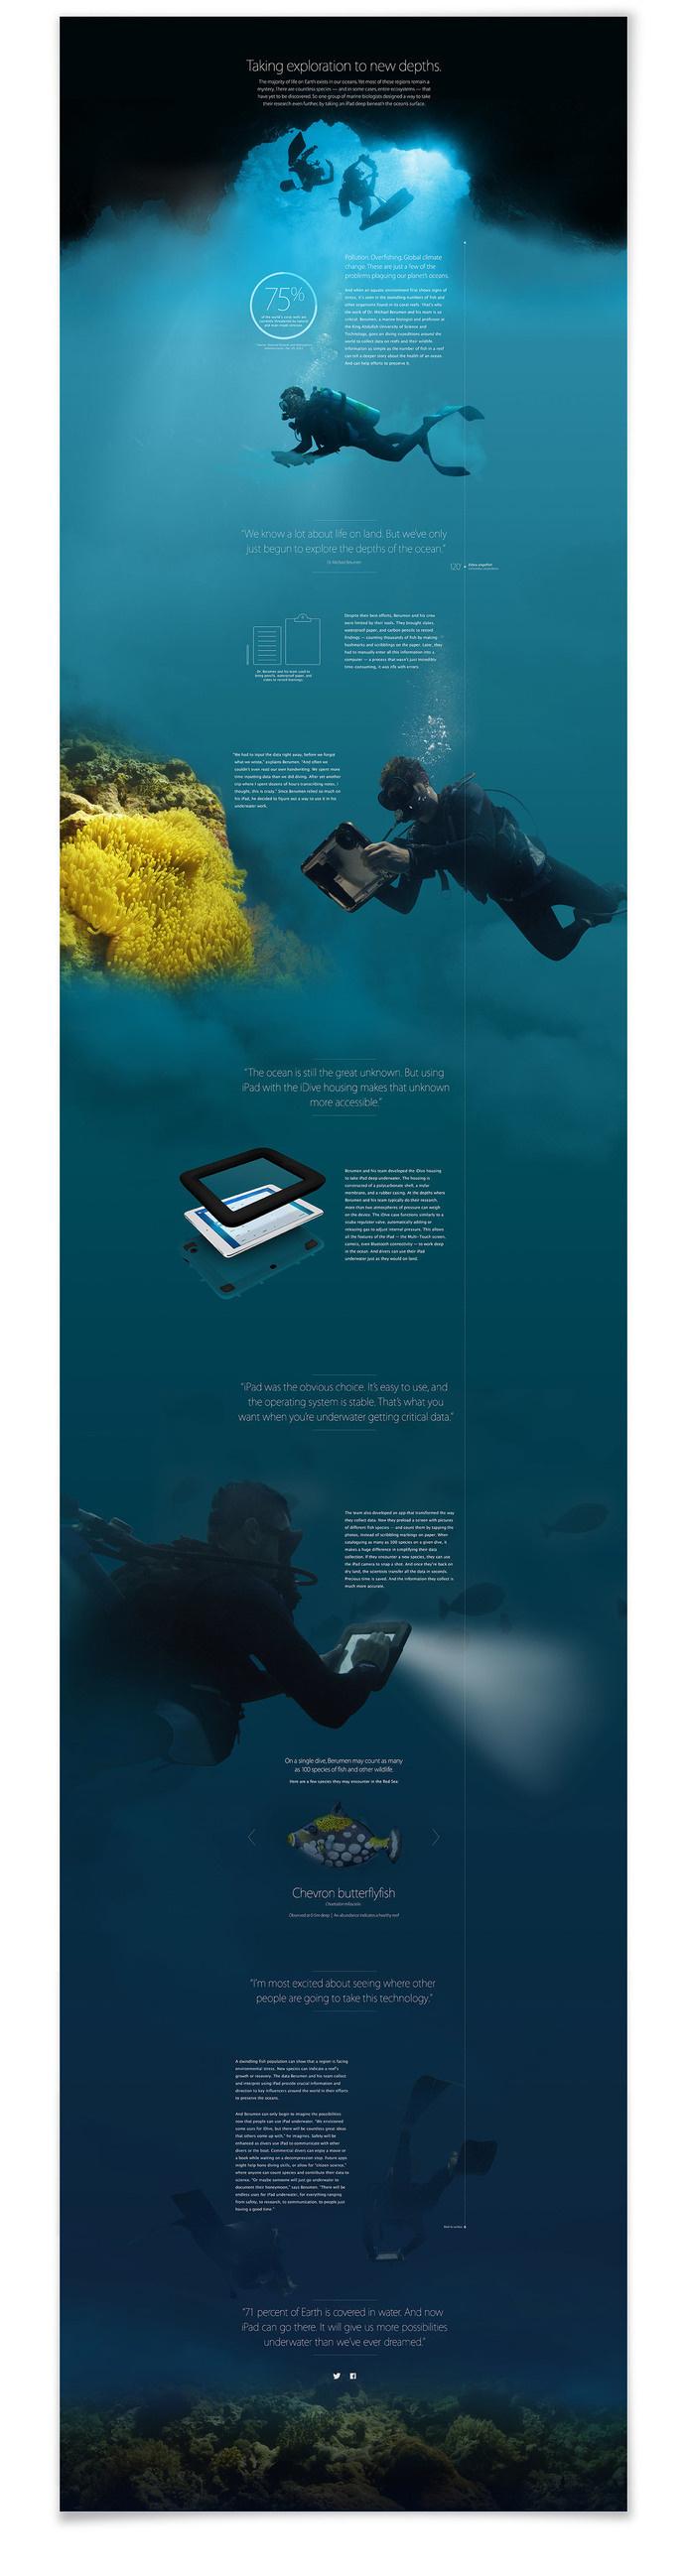 Mar Cubillos — Pixel Swell #site design #web design #diving